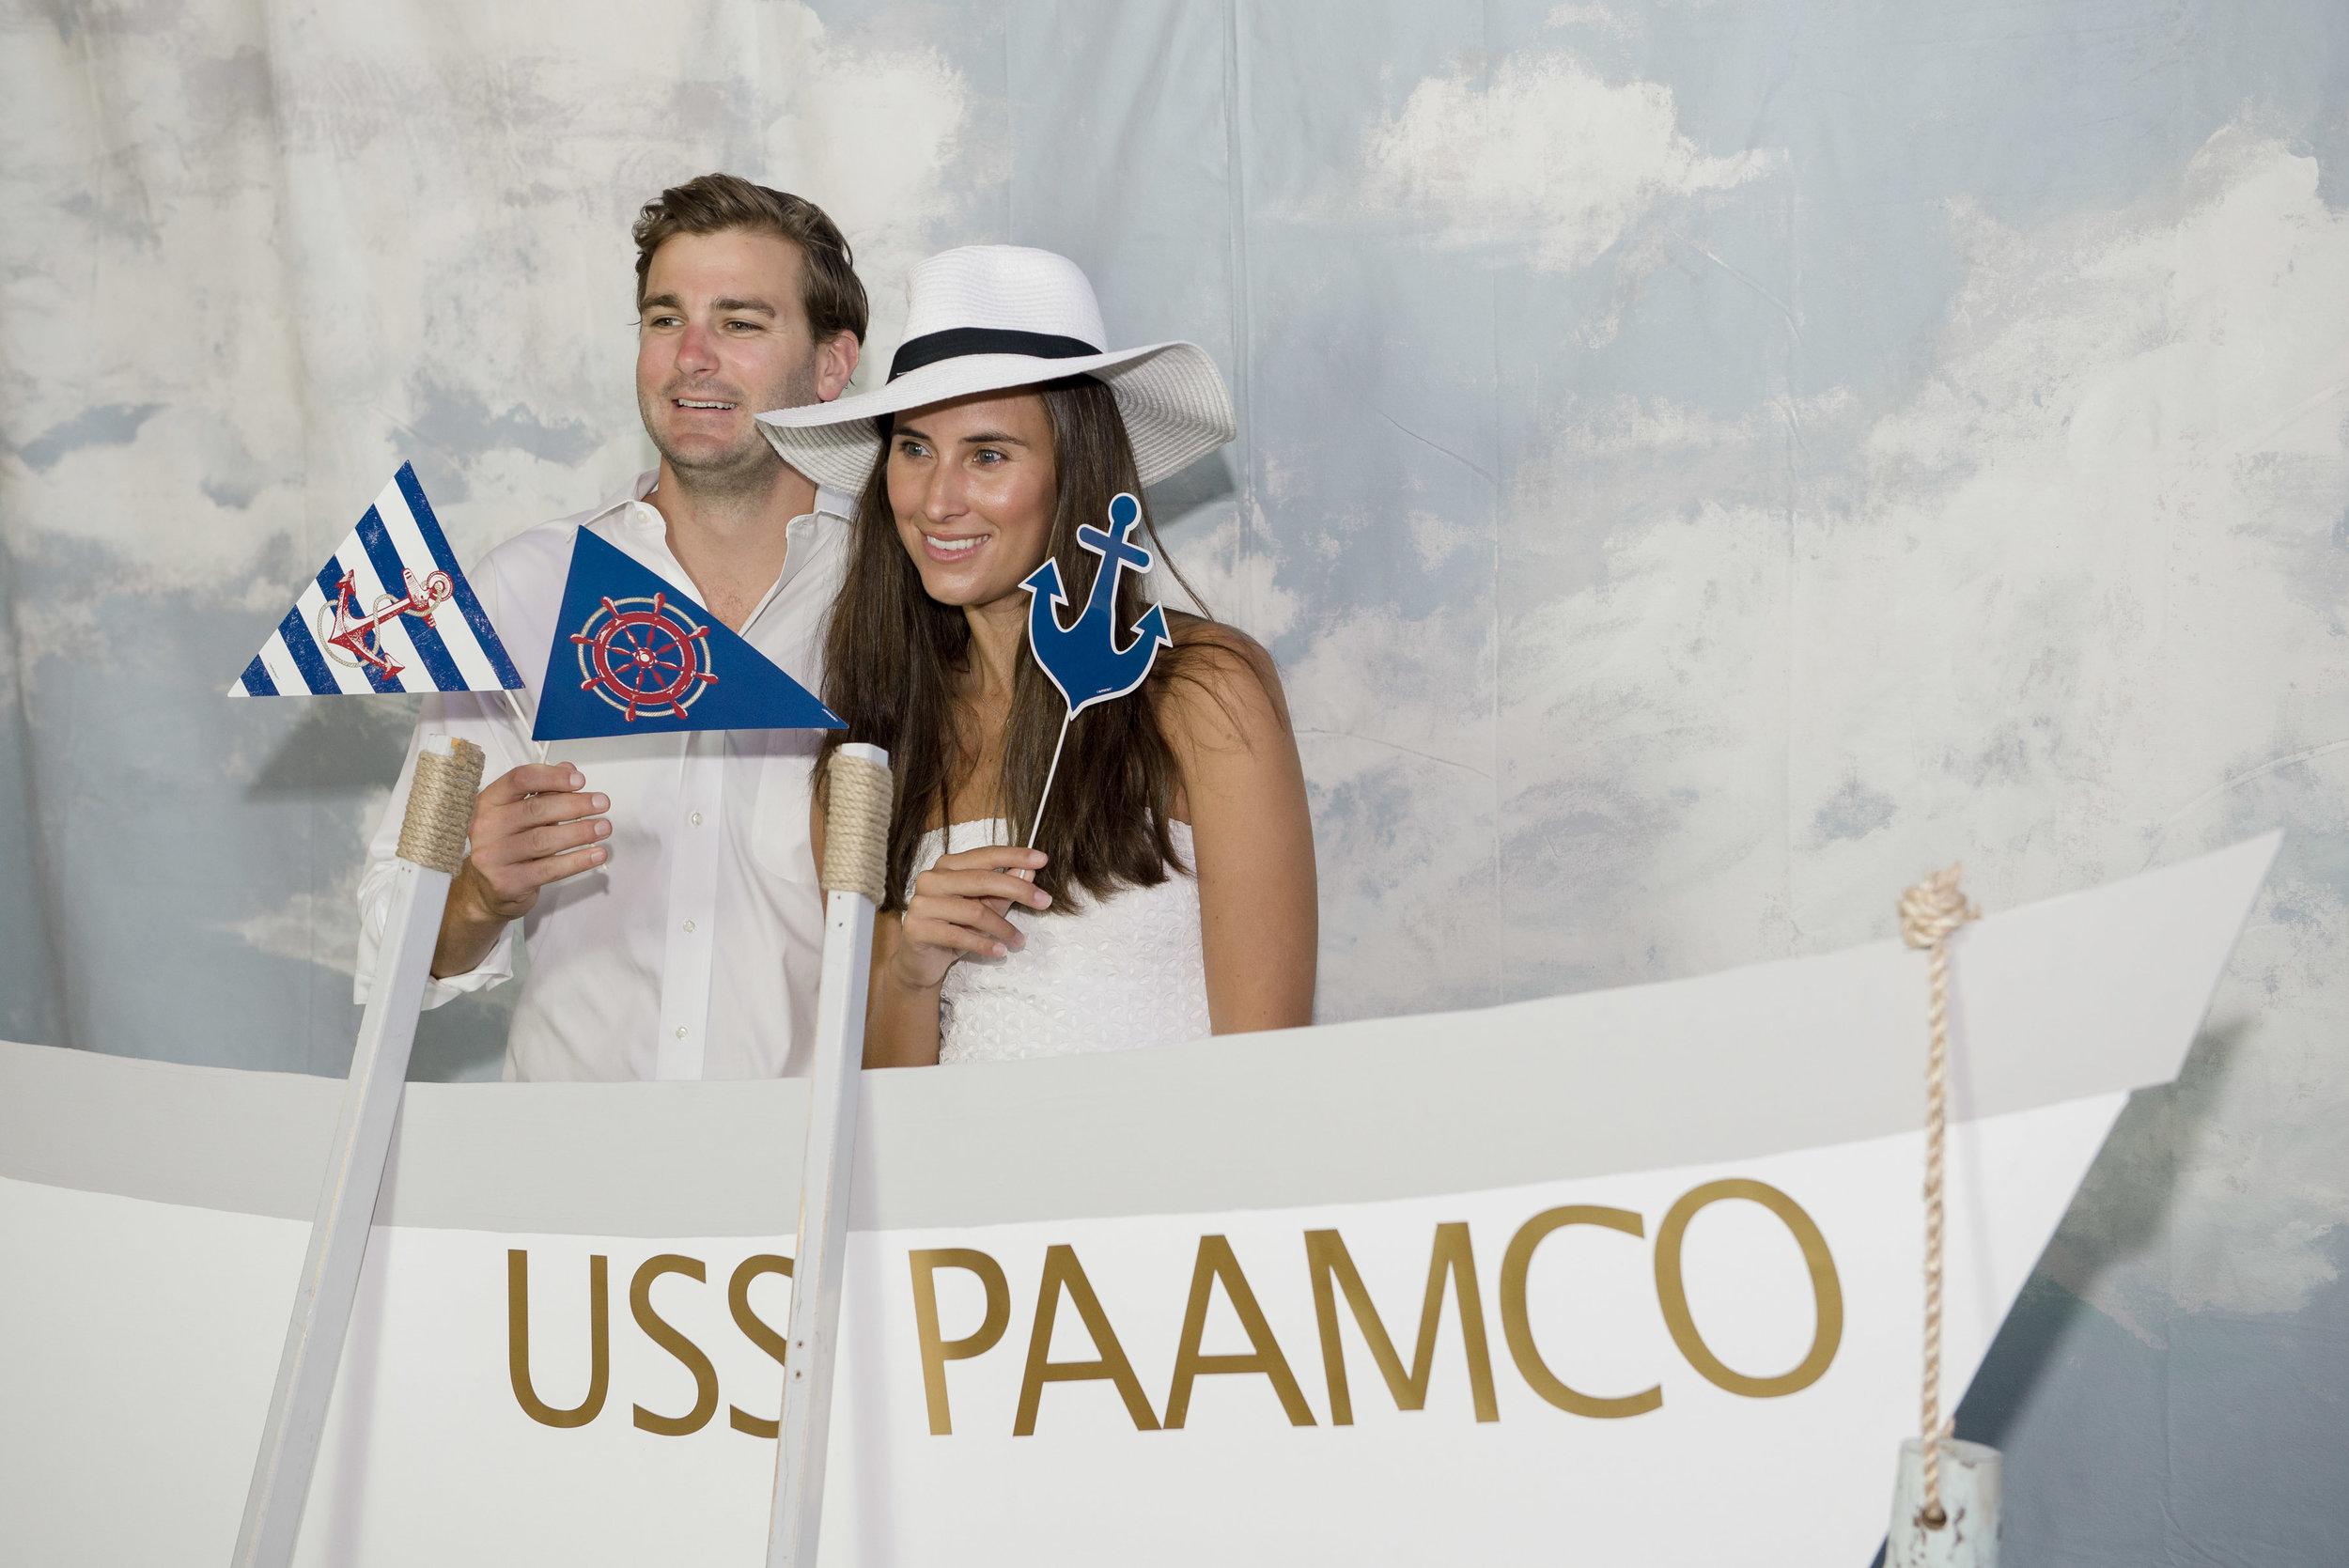 PAAMCO_Hamptons-208.jpg